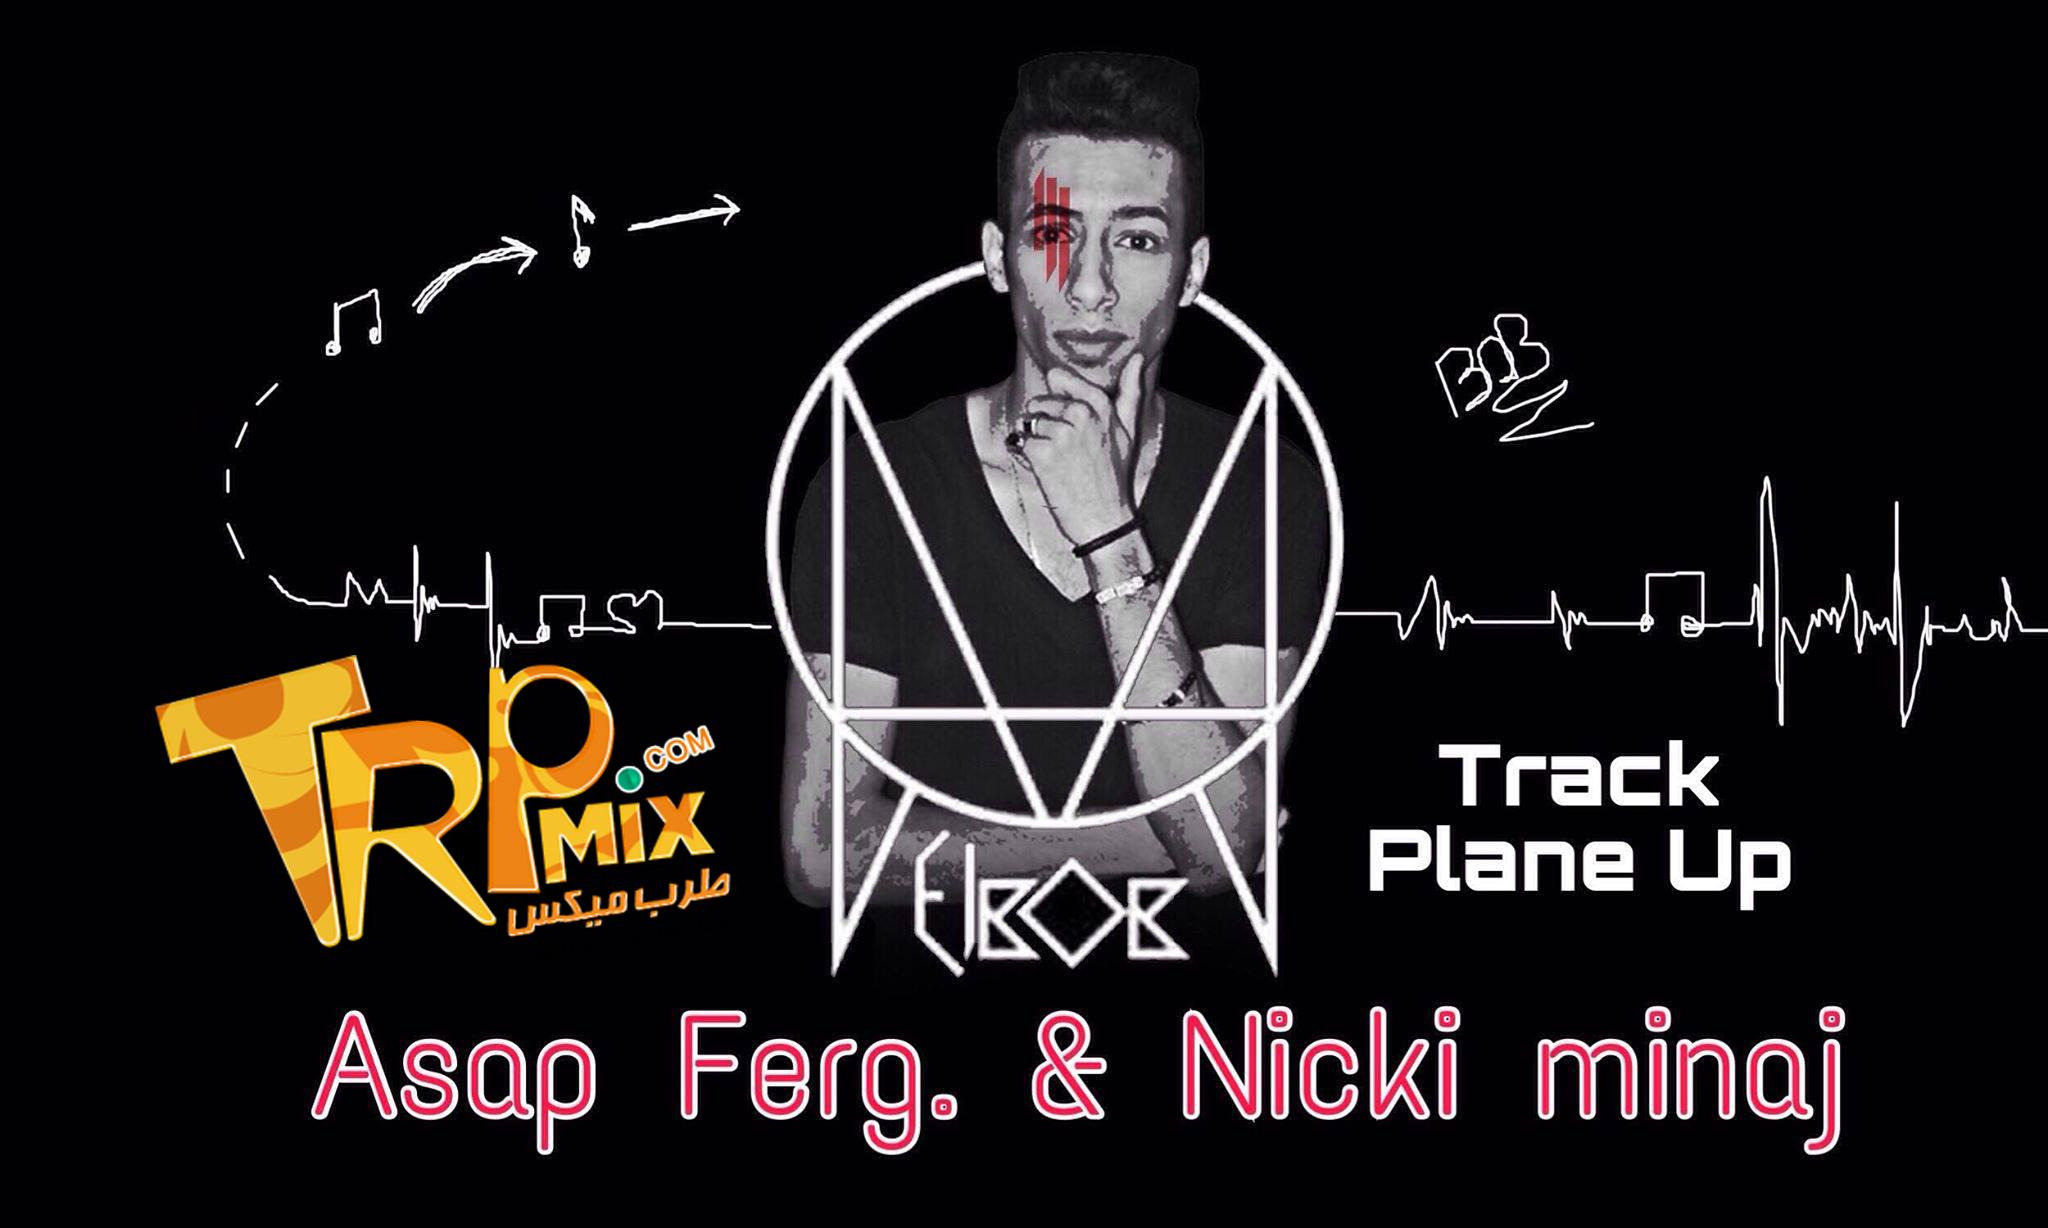 Asap - ferg & Nicki Minaj Plane Up Trp توزيع البوب شبح فيصل برعاية طرب ميكس 2018